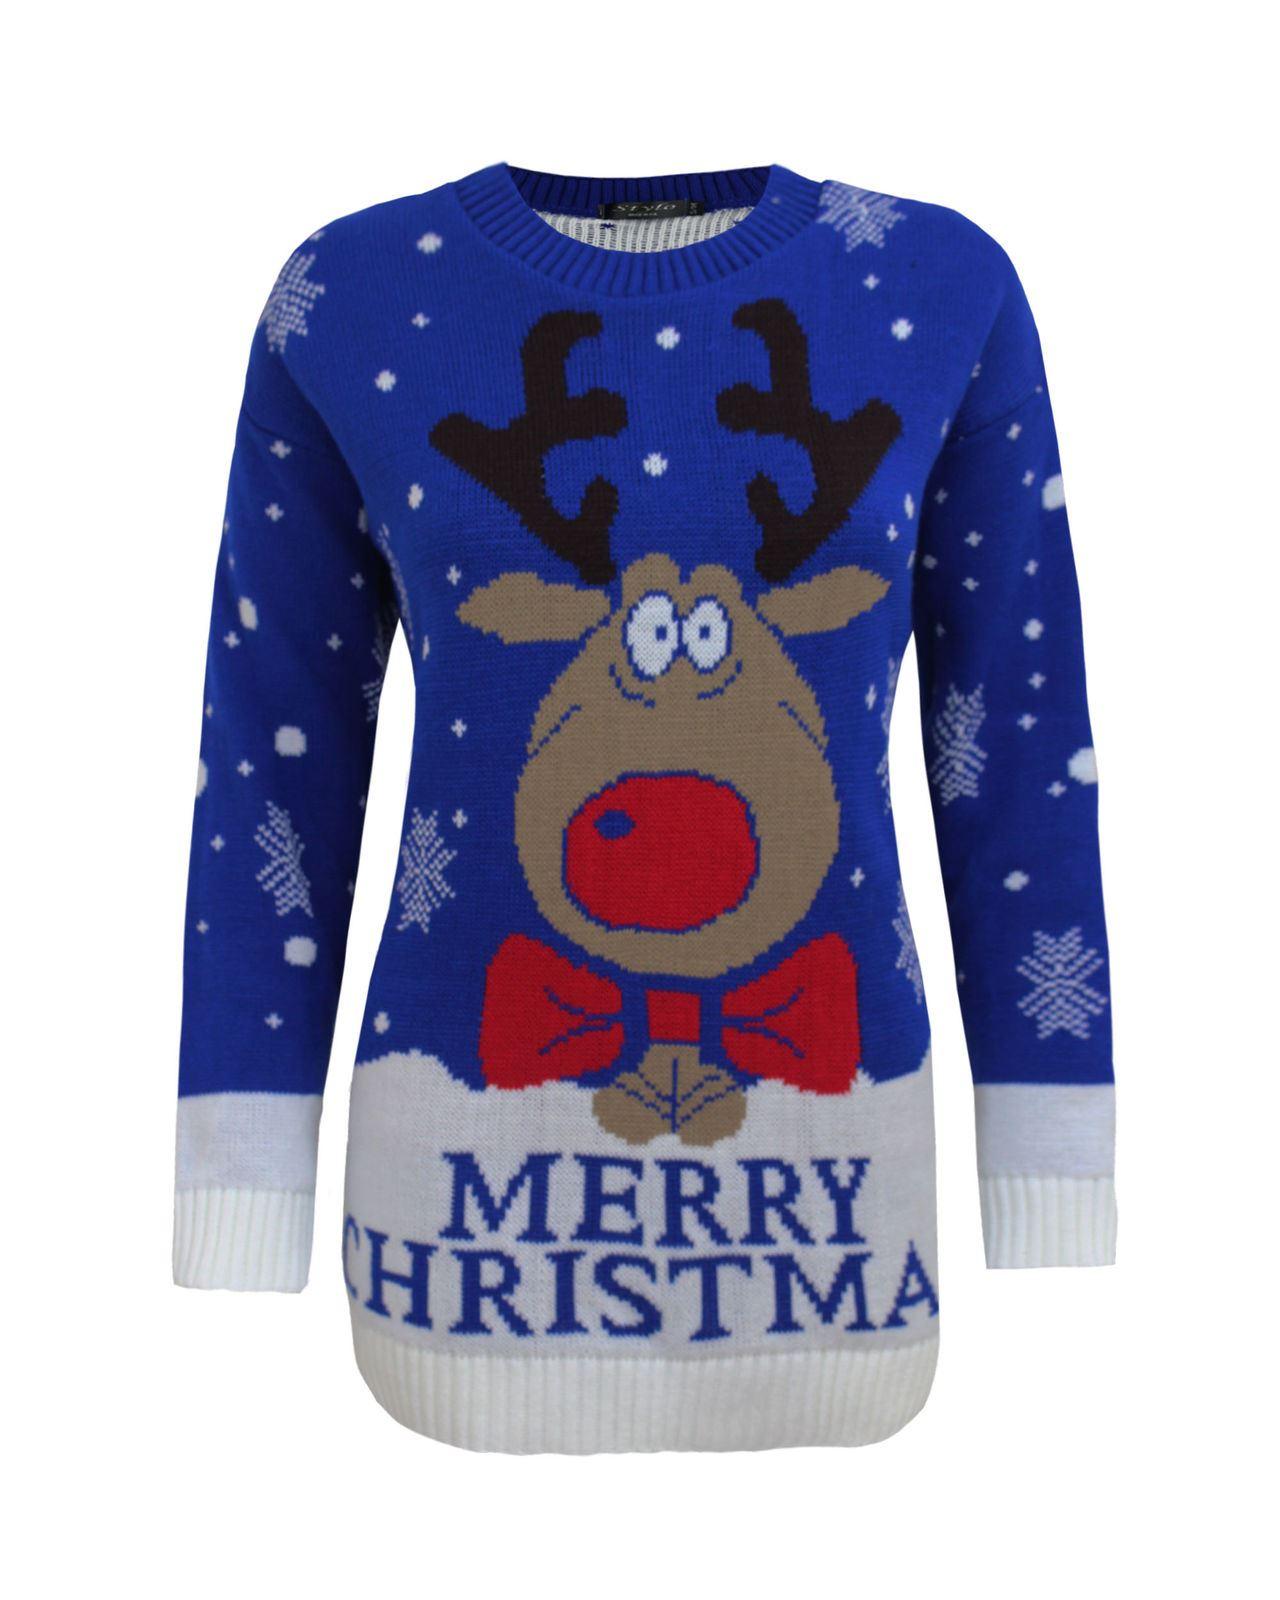 Kids Boy Girl Knitted Christmas Xmas Olaf Minion Chunky Knit Jumper Novelty T...